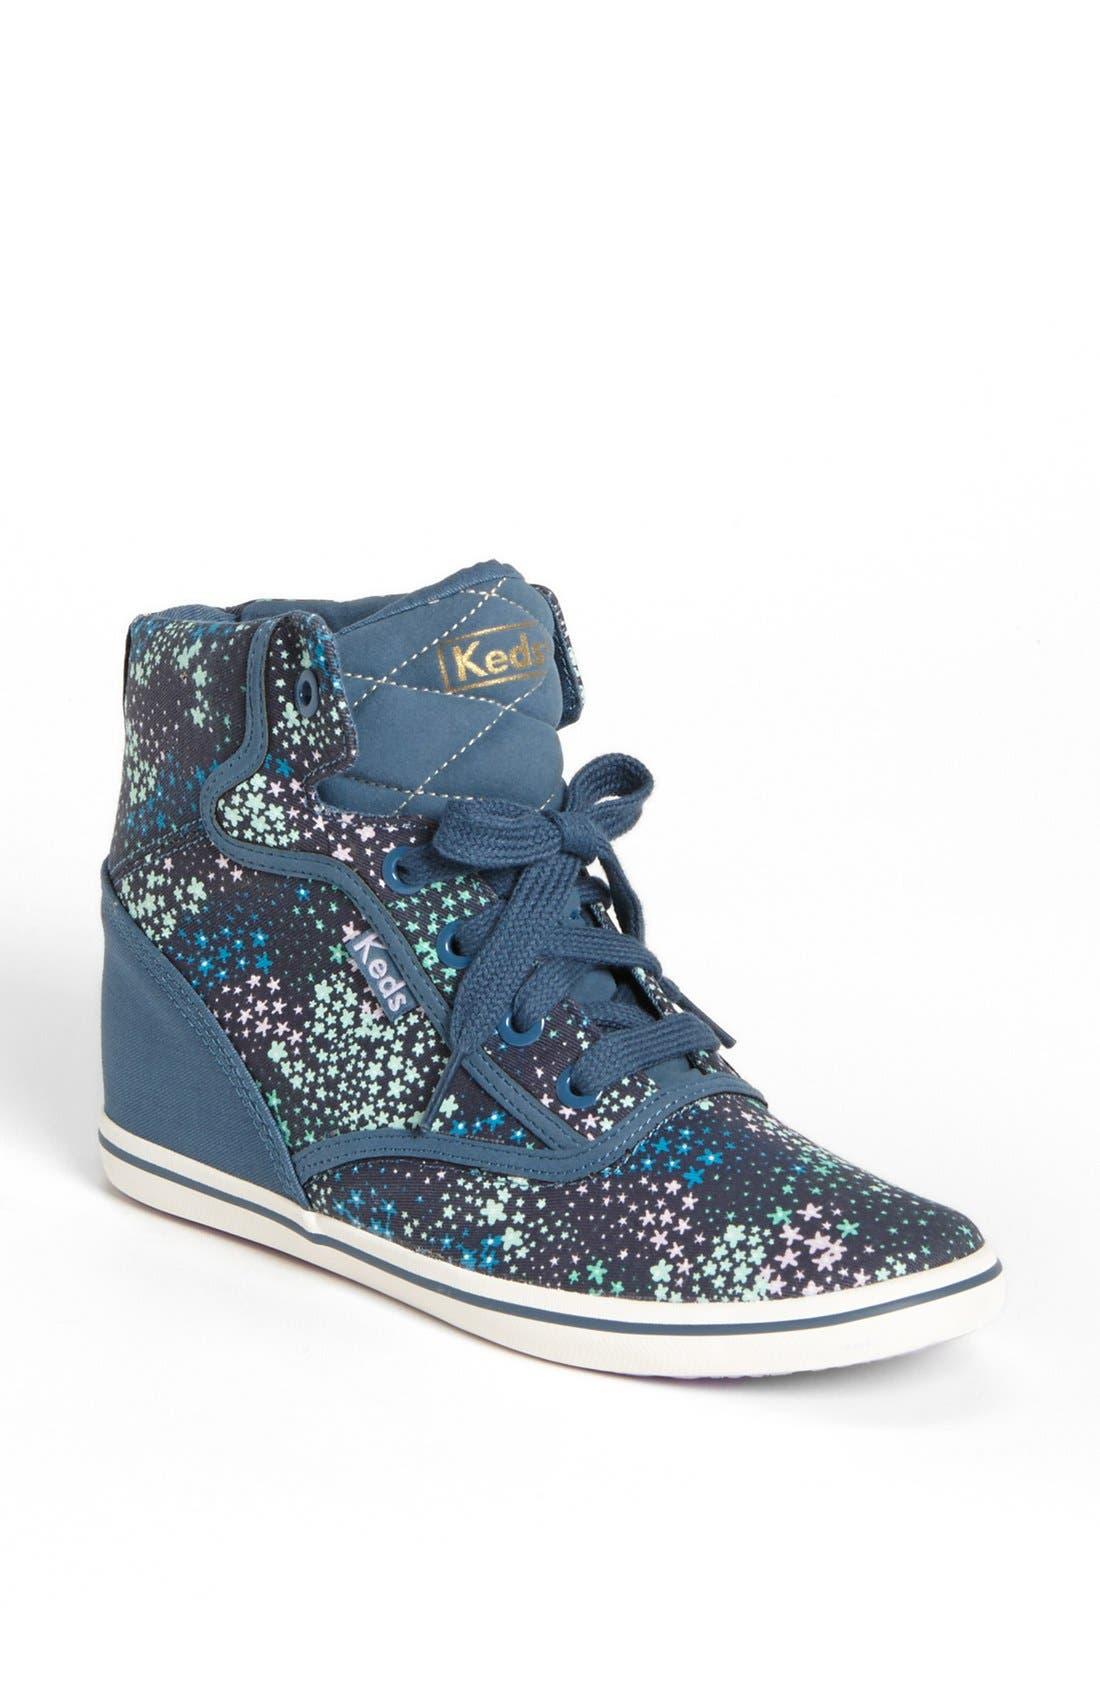 Main Image - Keds® 'Rookie' Wedge High Top Sneaker (Women)